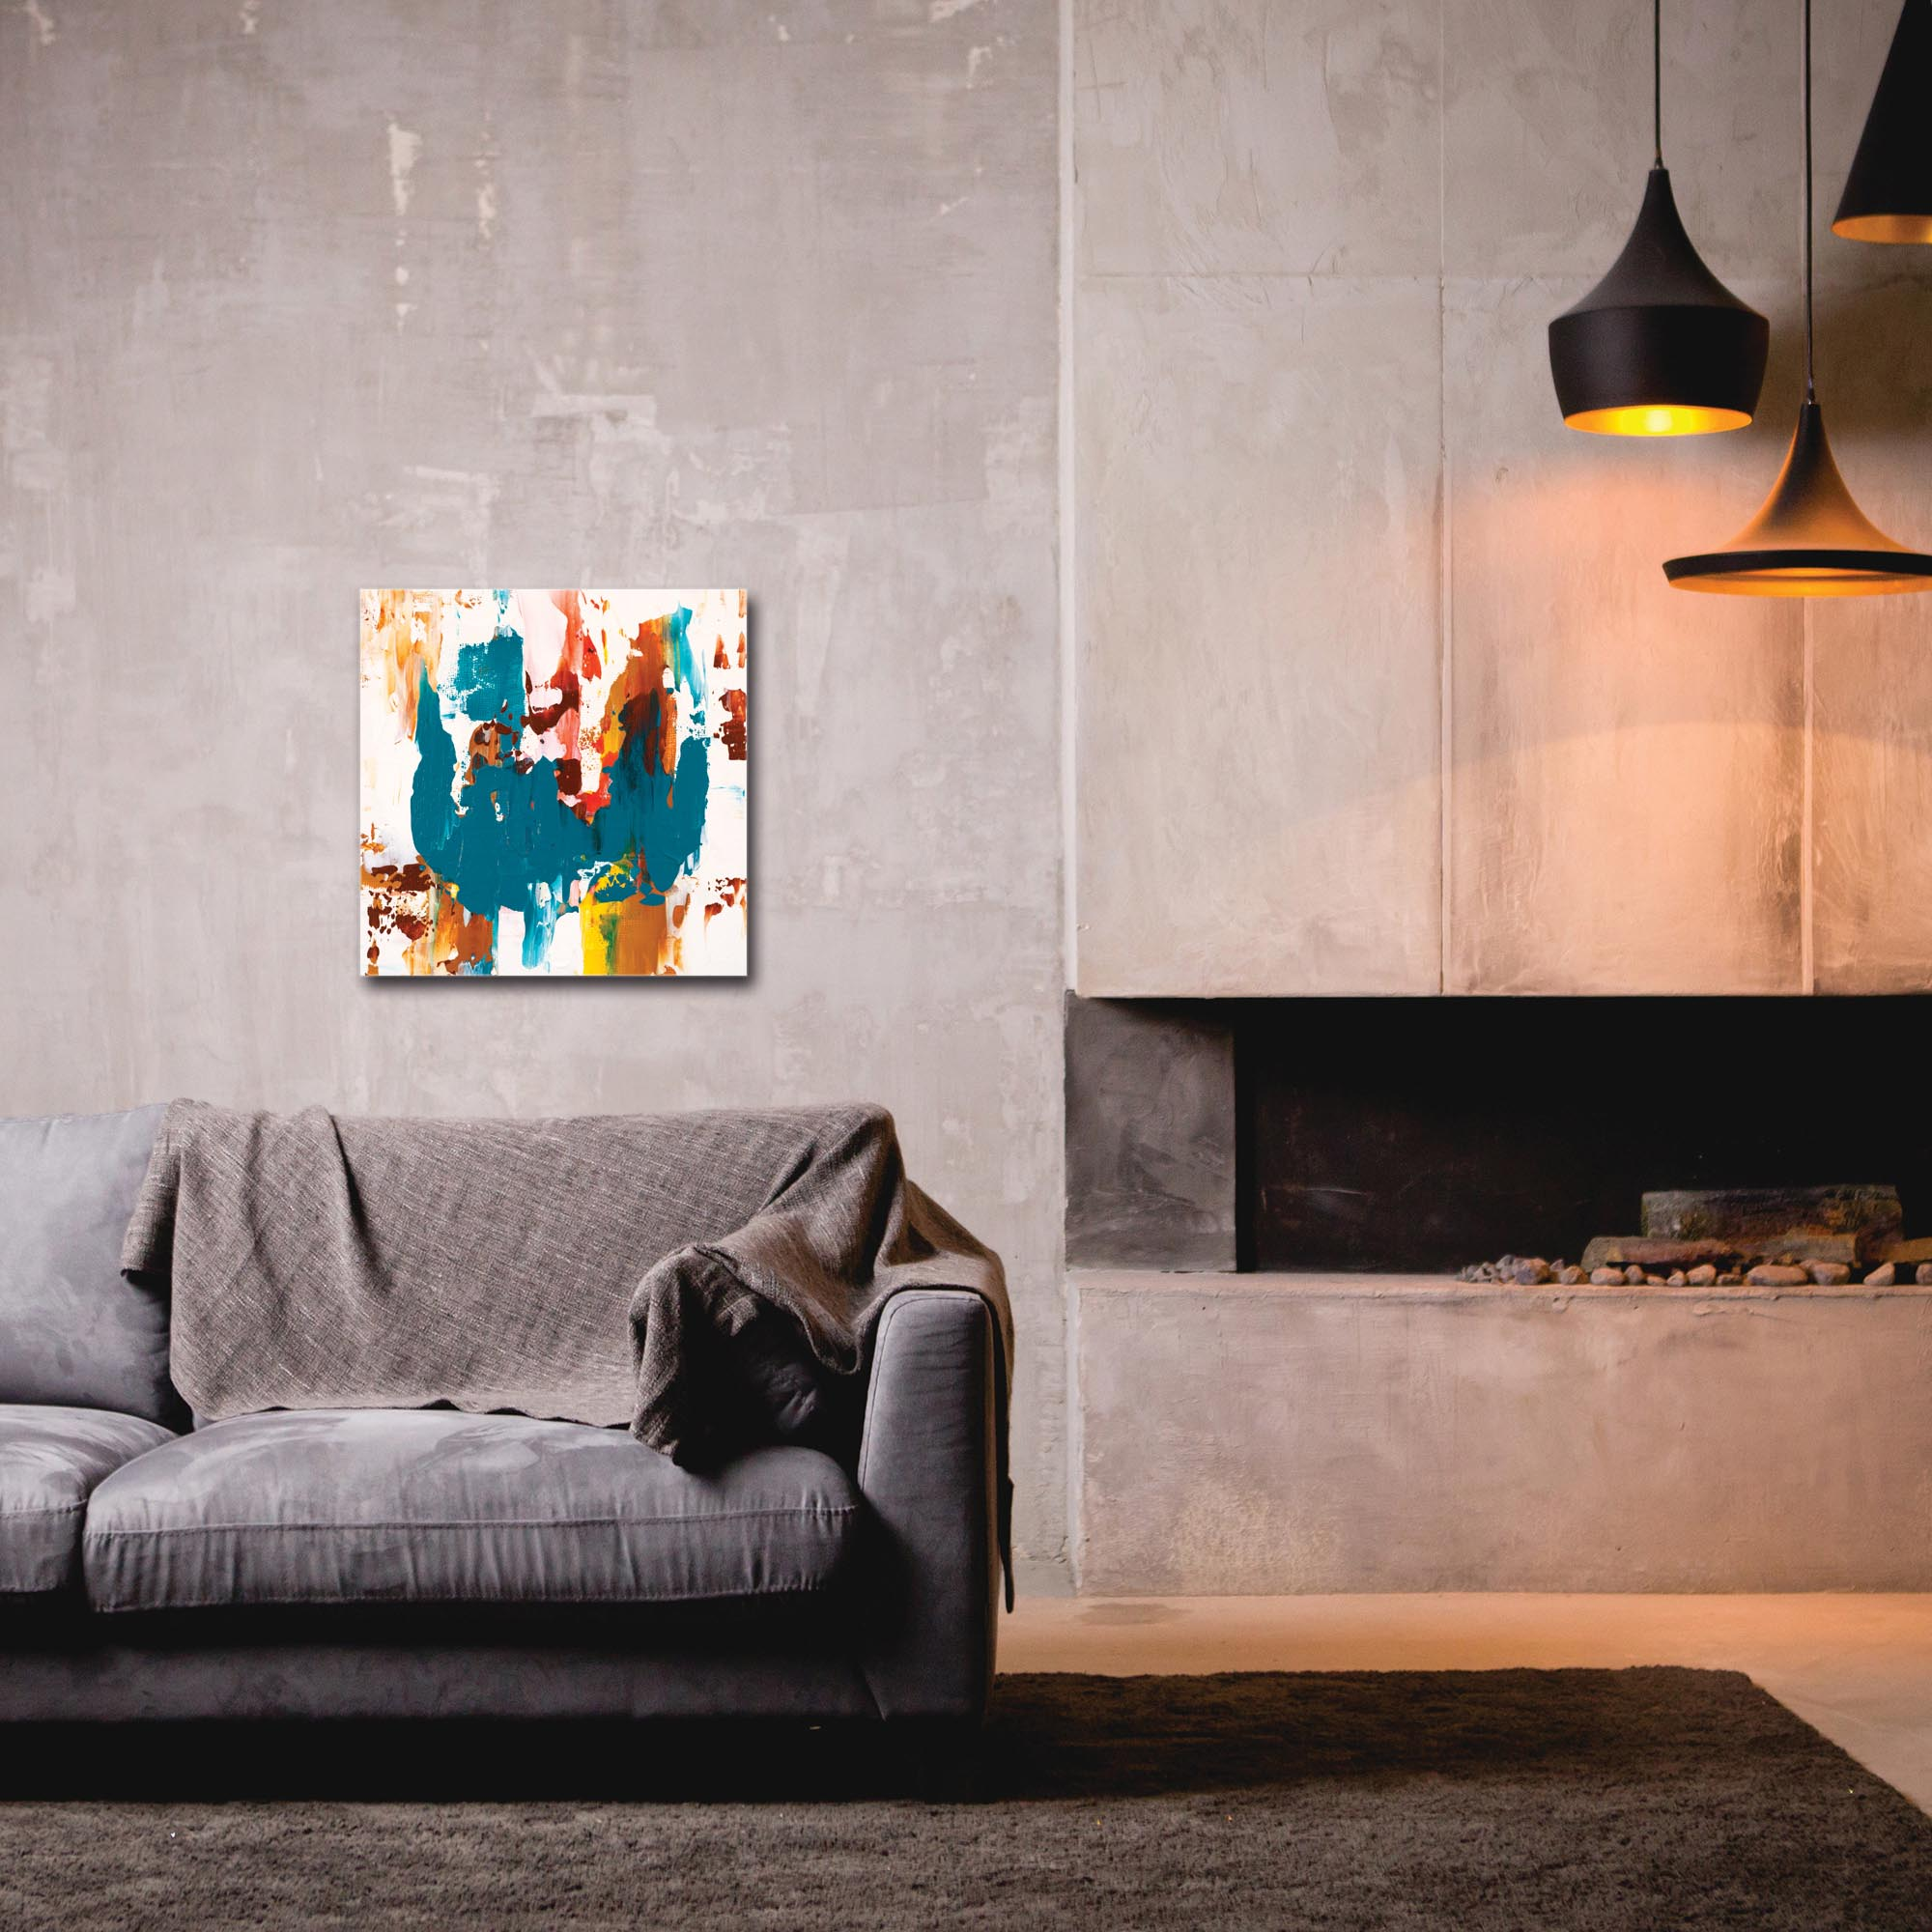 Abstract Wall Art 'Urban Life 8' - Urban Decor on Metal or Plexiglass - Image 3